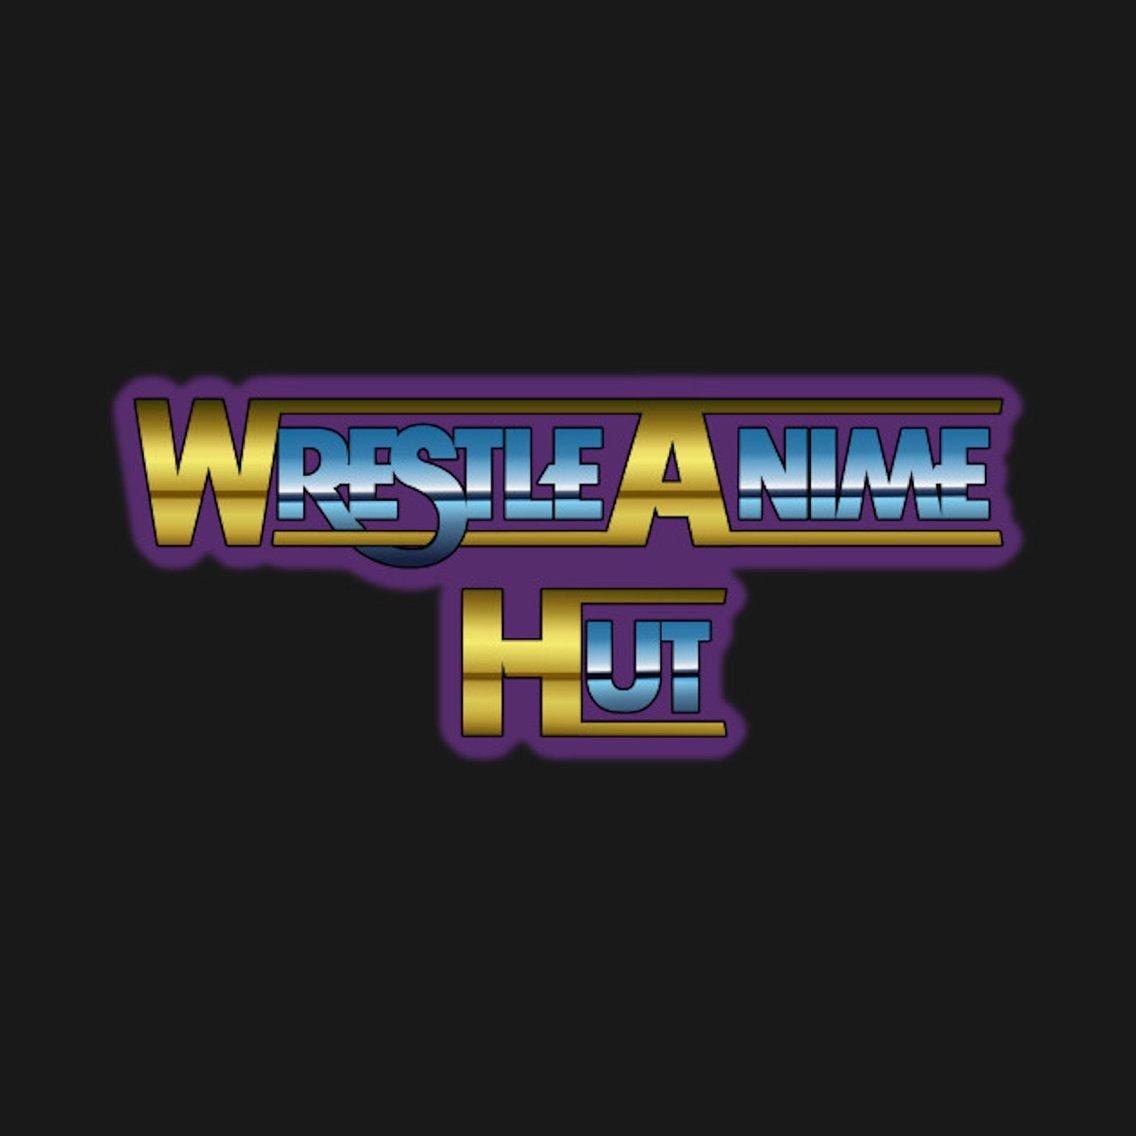 Wrestle-Anime Hut - immagine di copertina